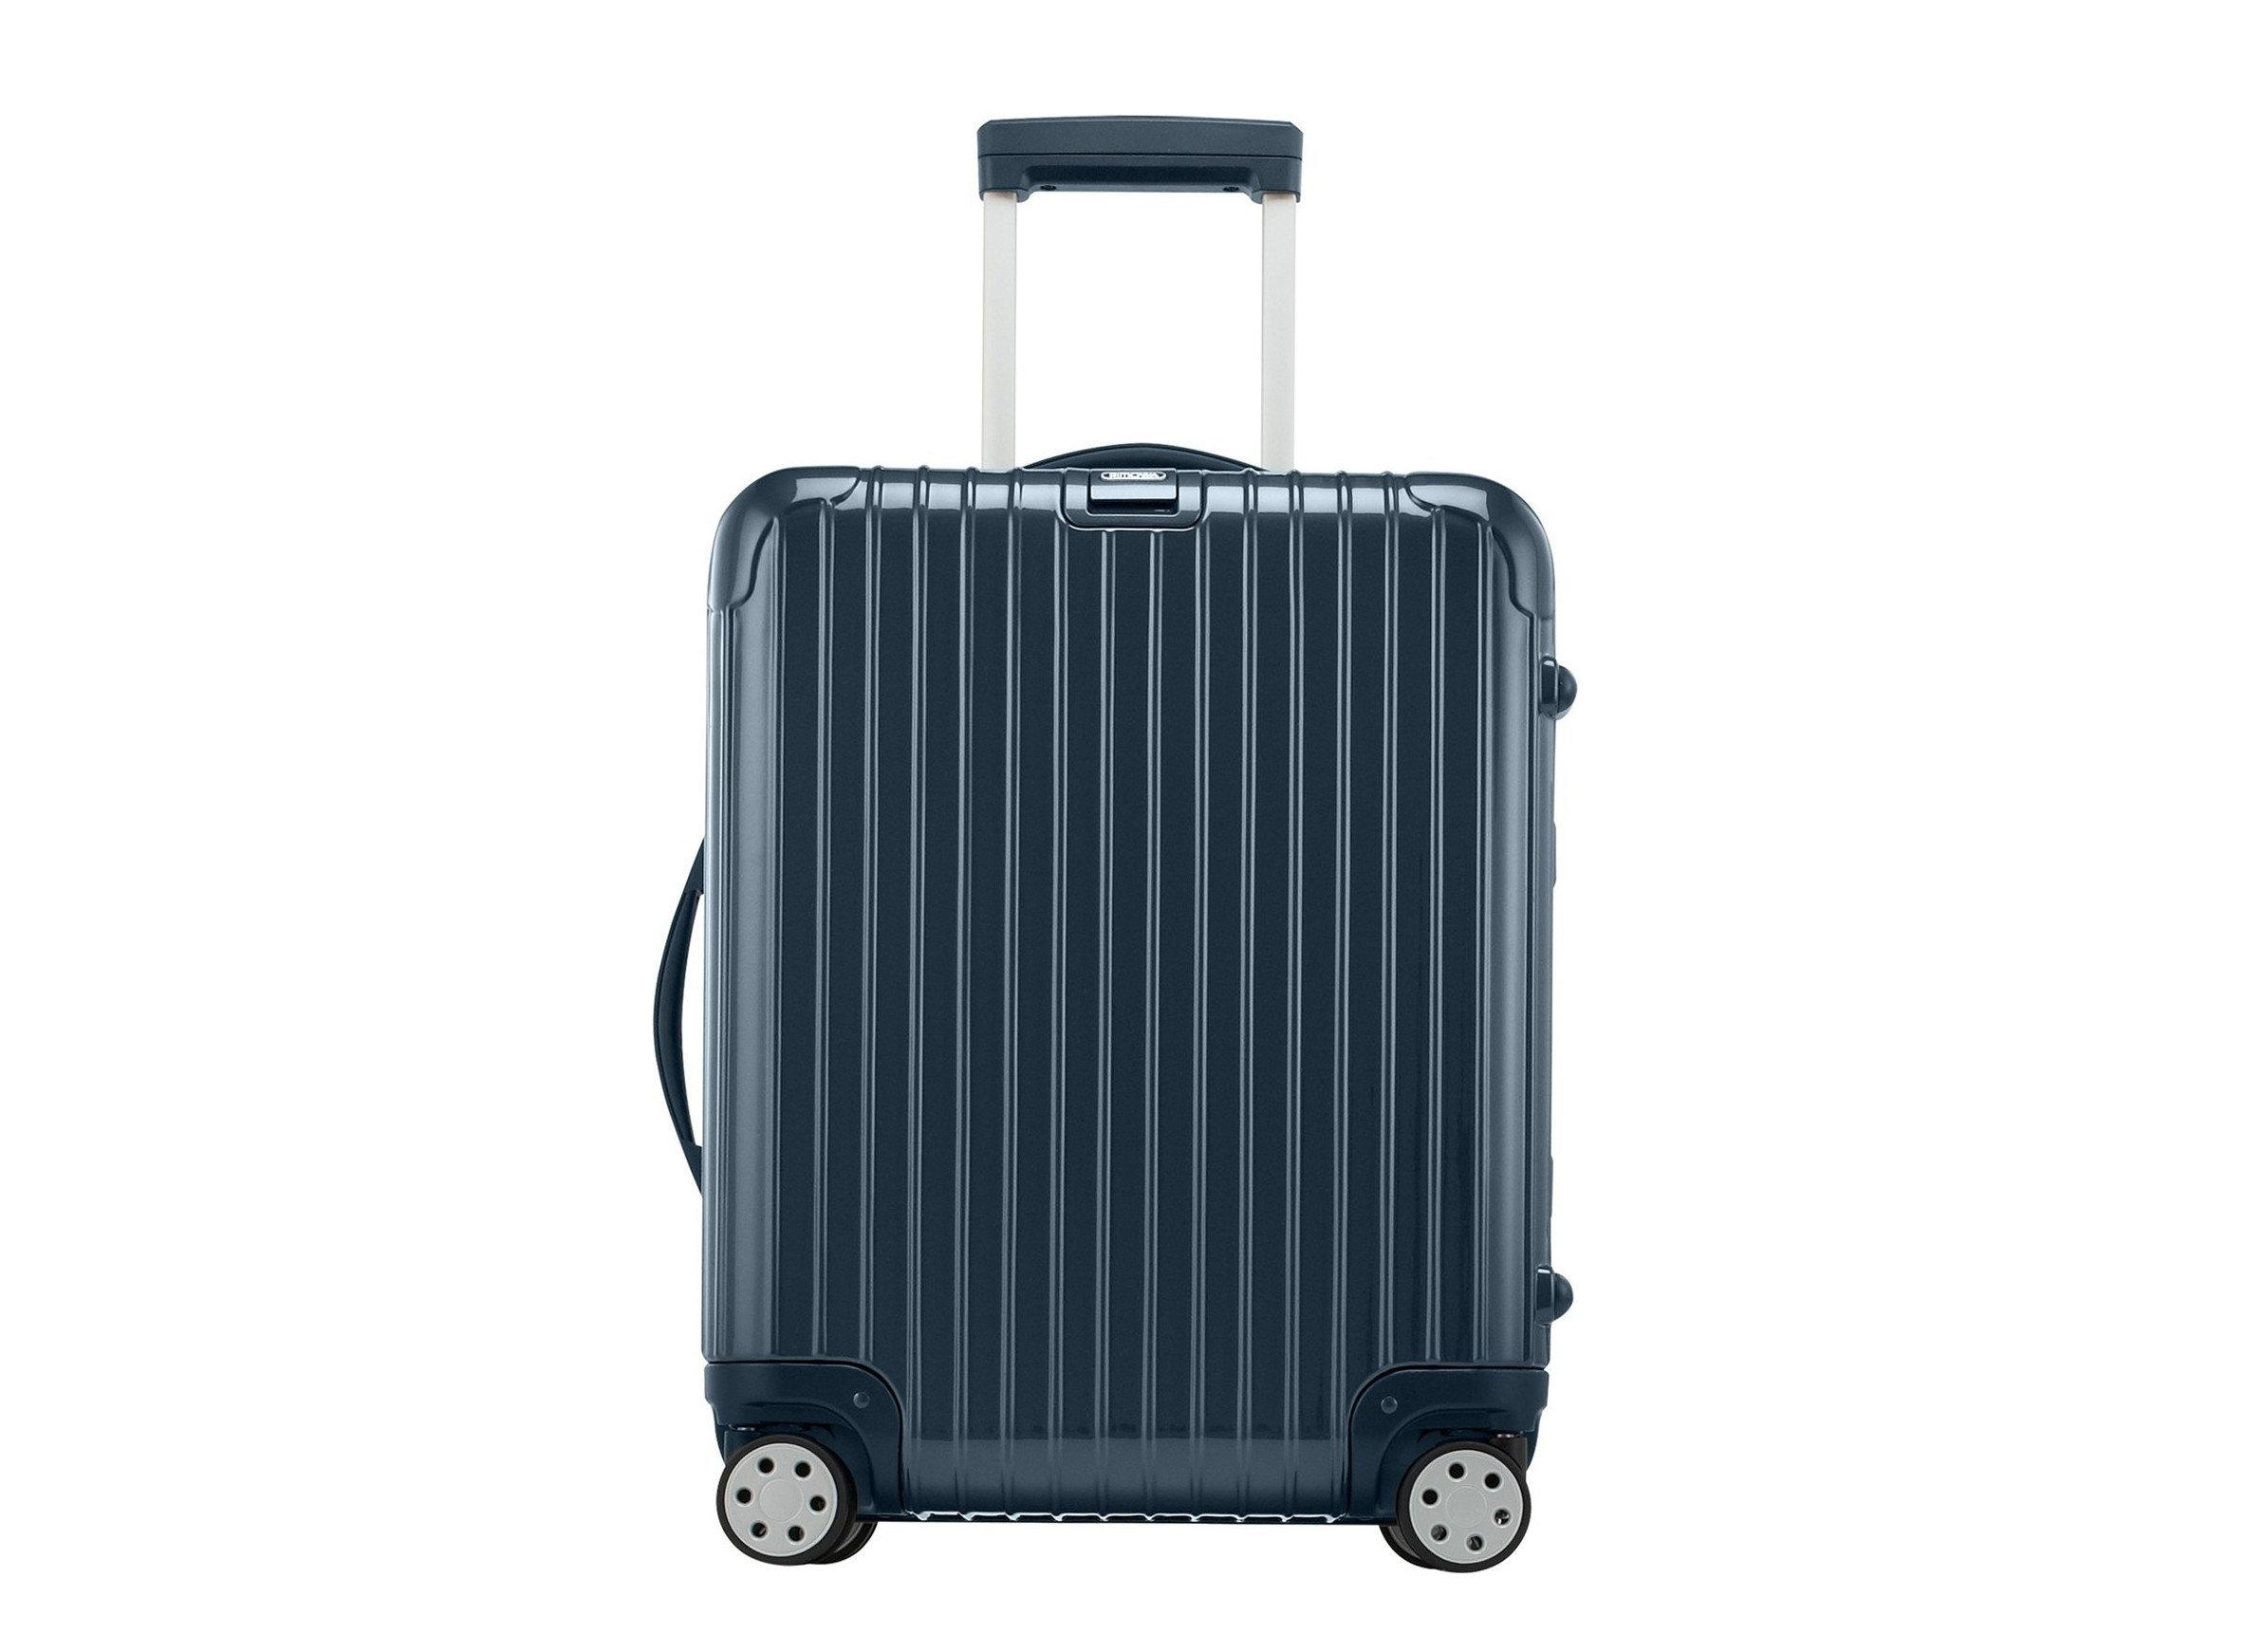 Style + Design Travel Shop Travel Tech Travel Tips electric blue suitcase product cobalt blue hand luggage product design luggage & bags bag baggage pattern brand